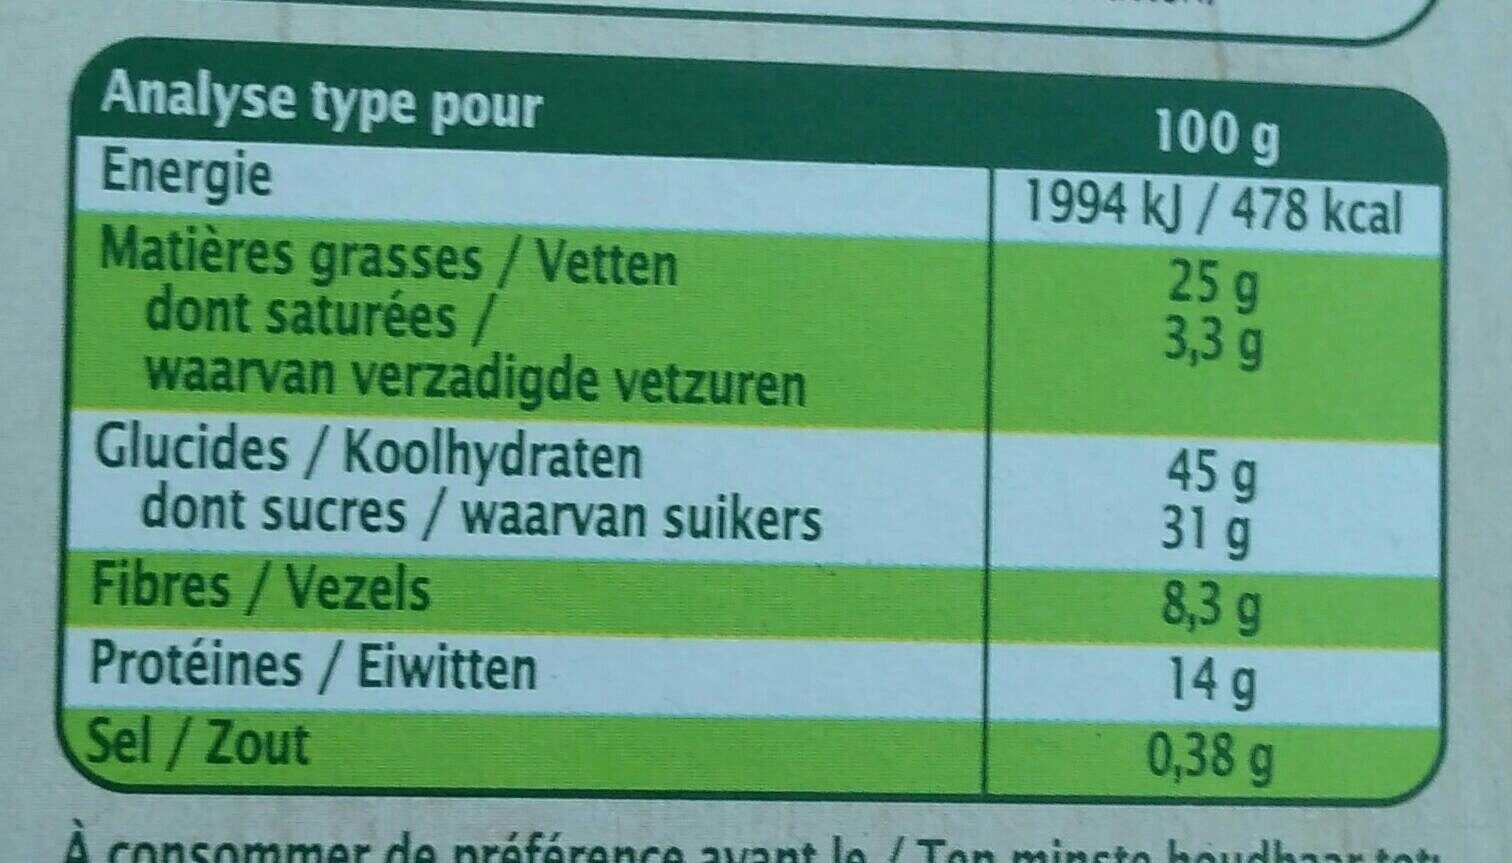 Super Barres - figue amande amarante - Informations nutritionnelles - fr